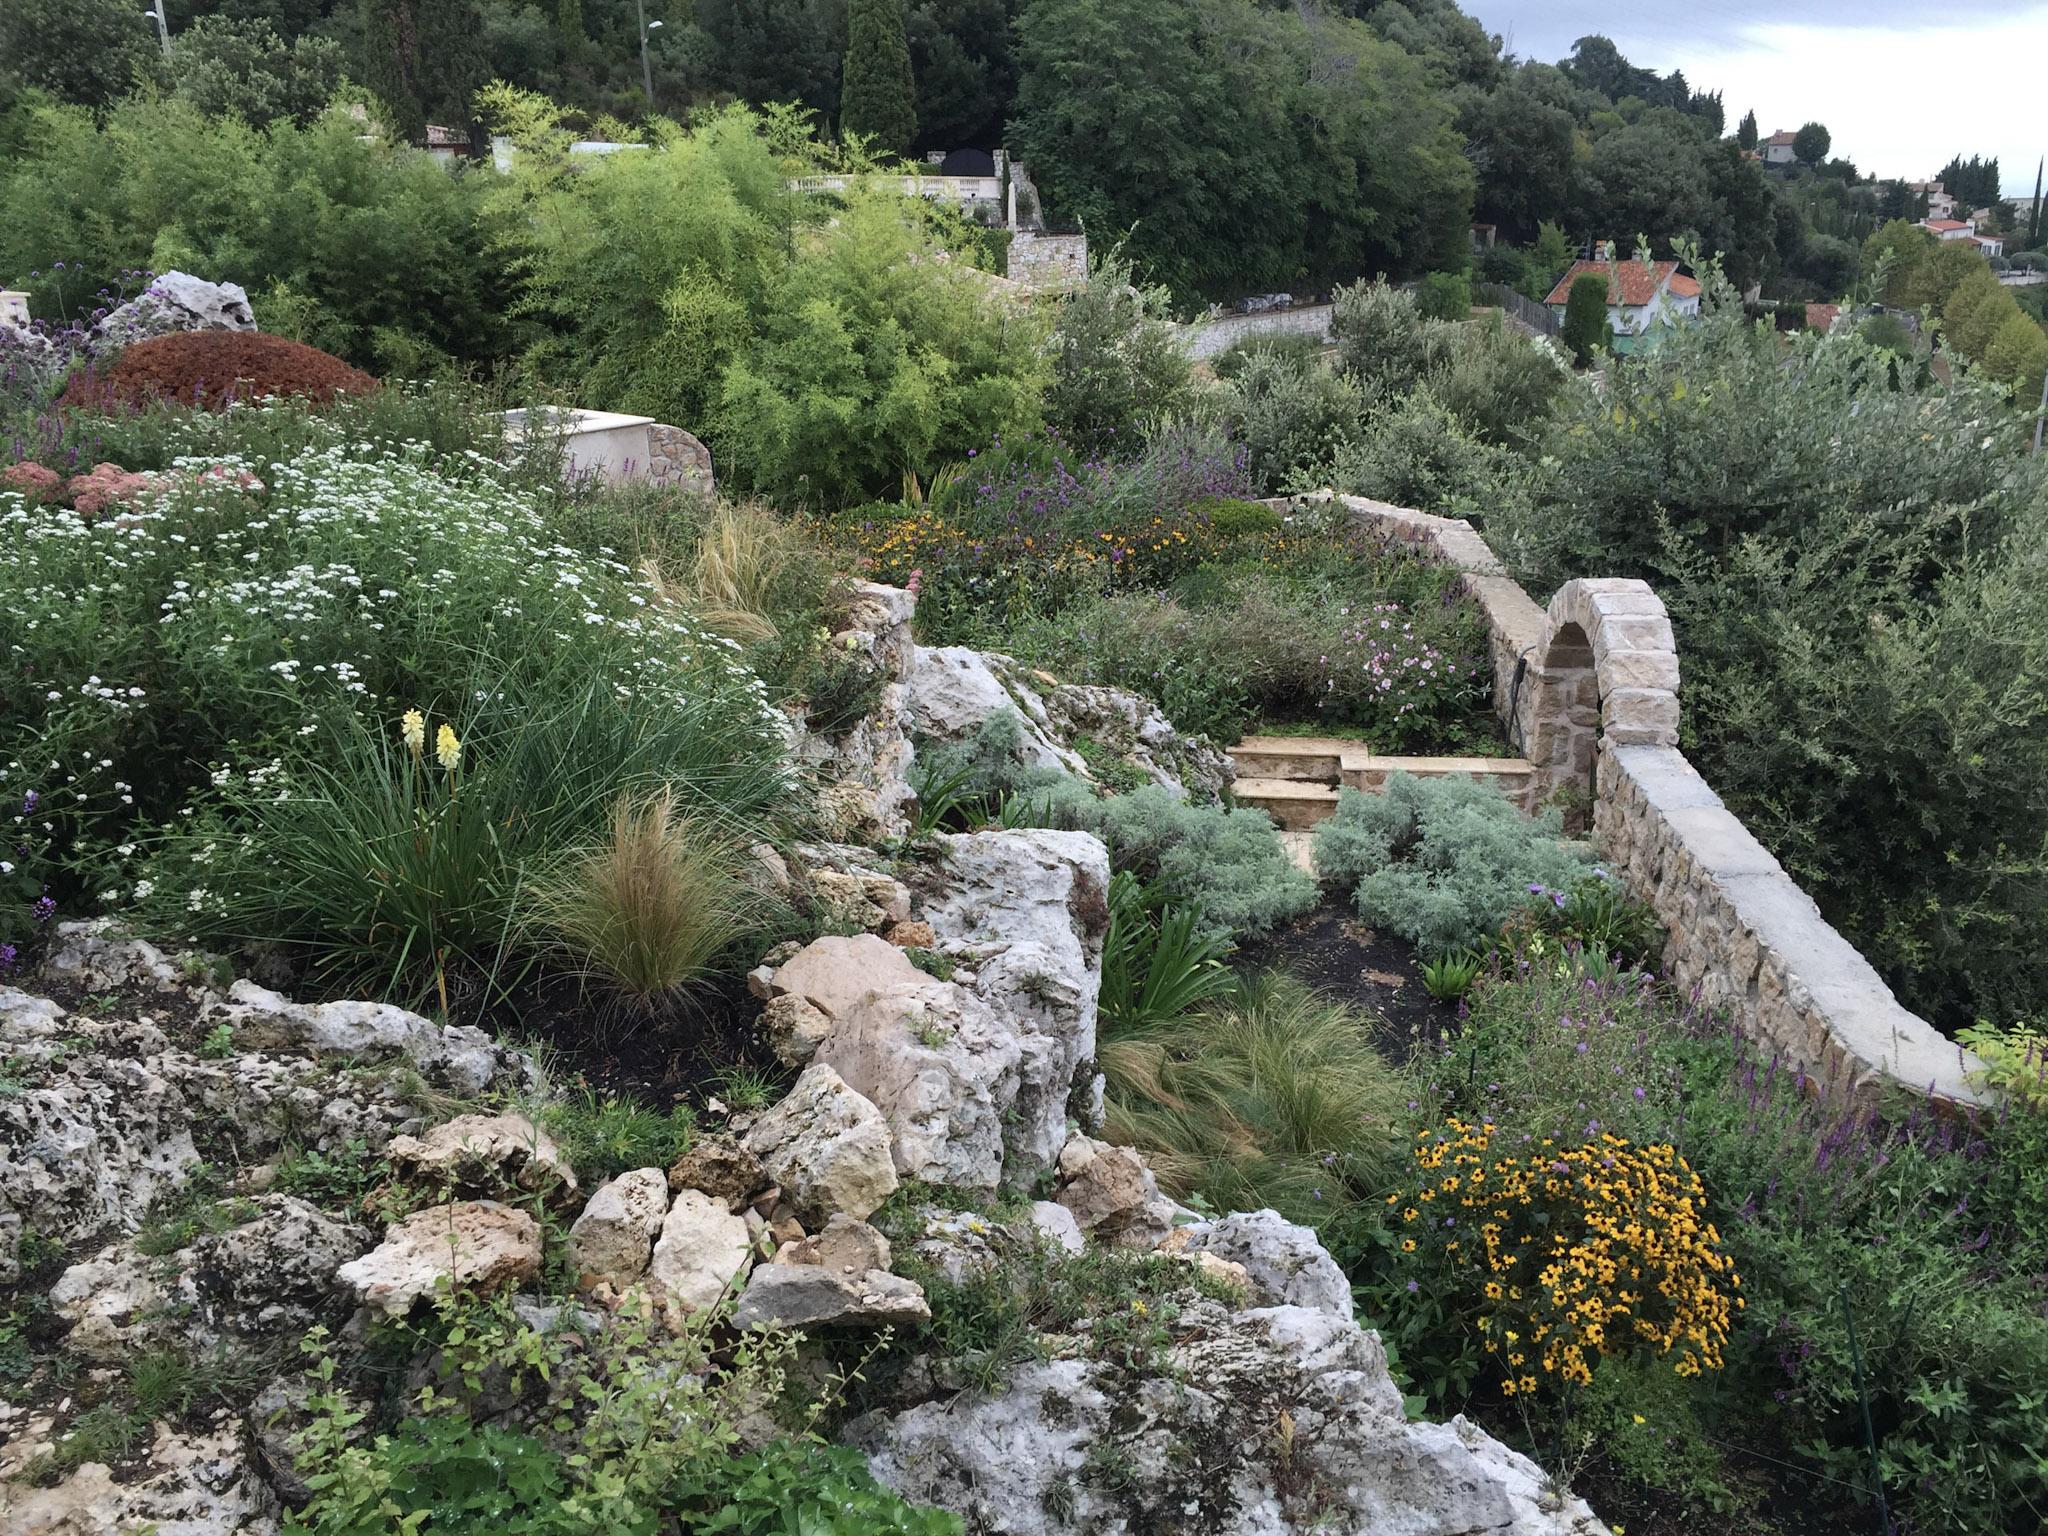 French Riviera – Garden in the Hills